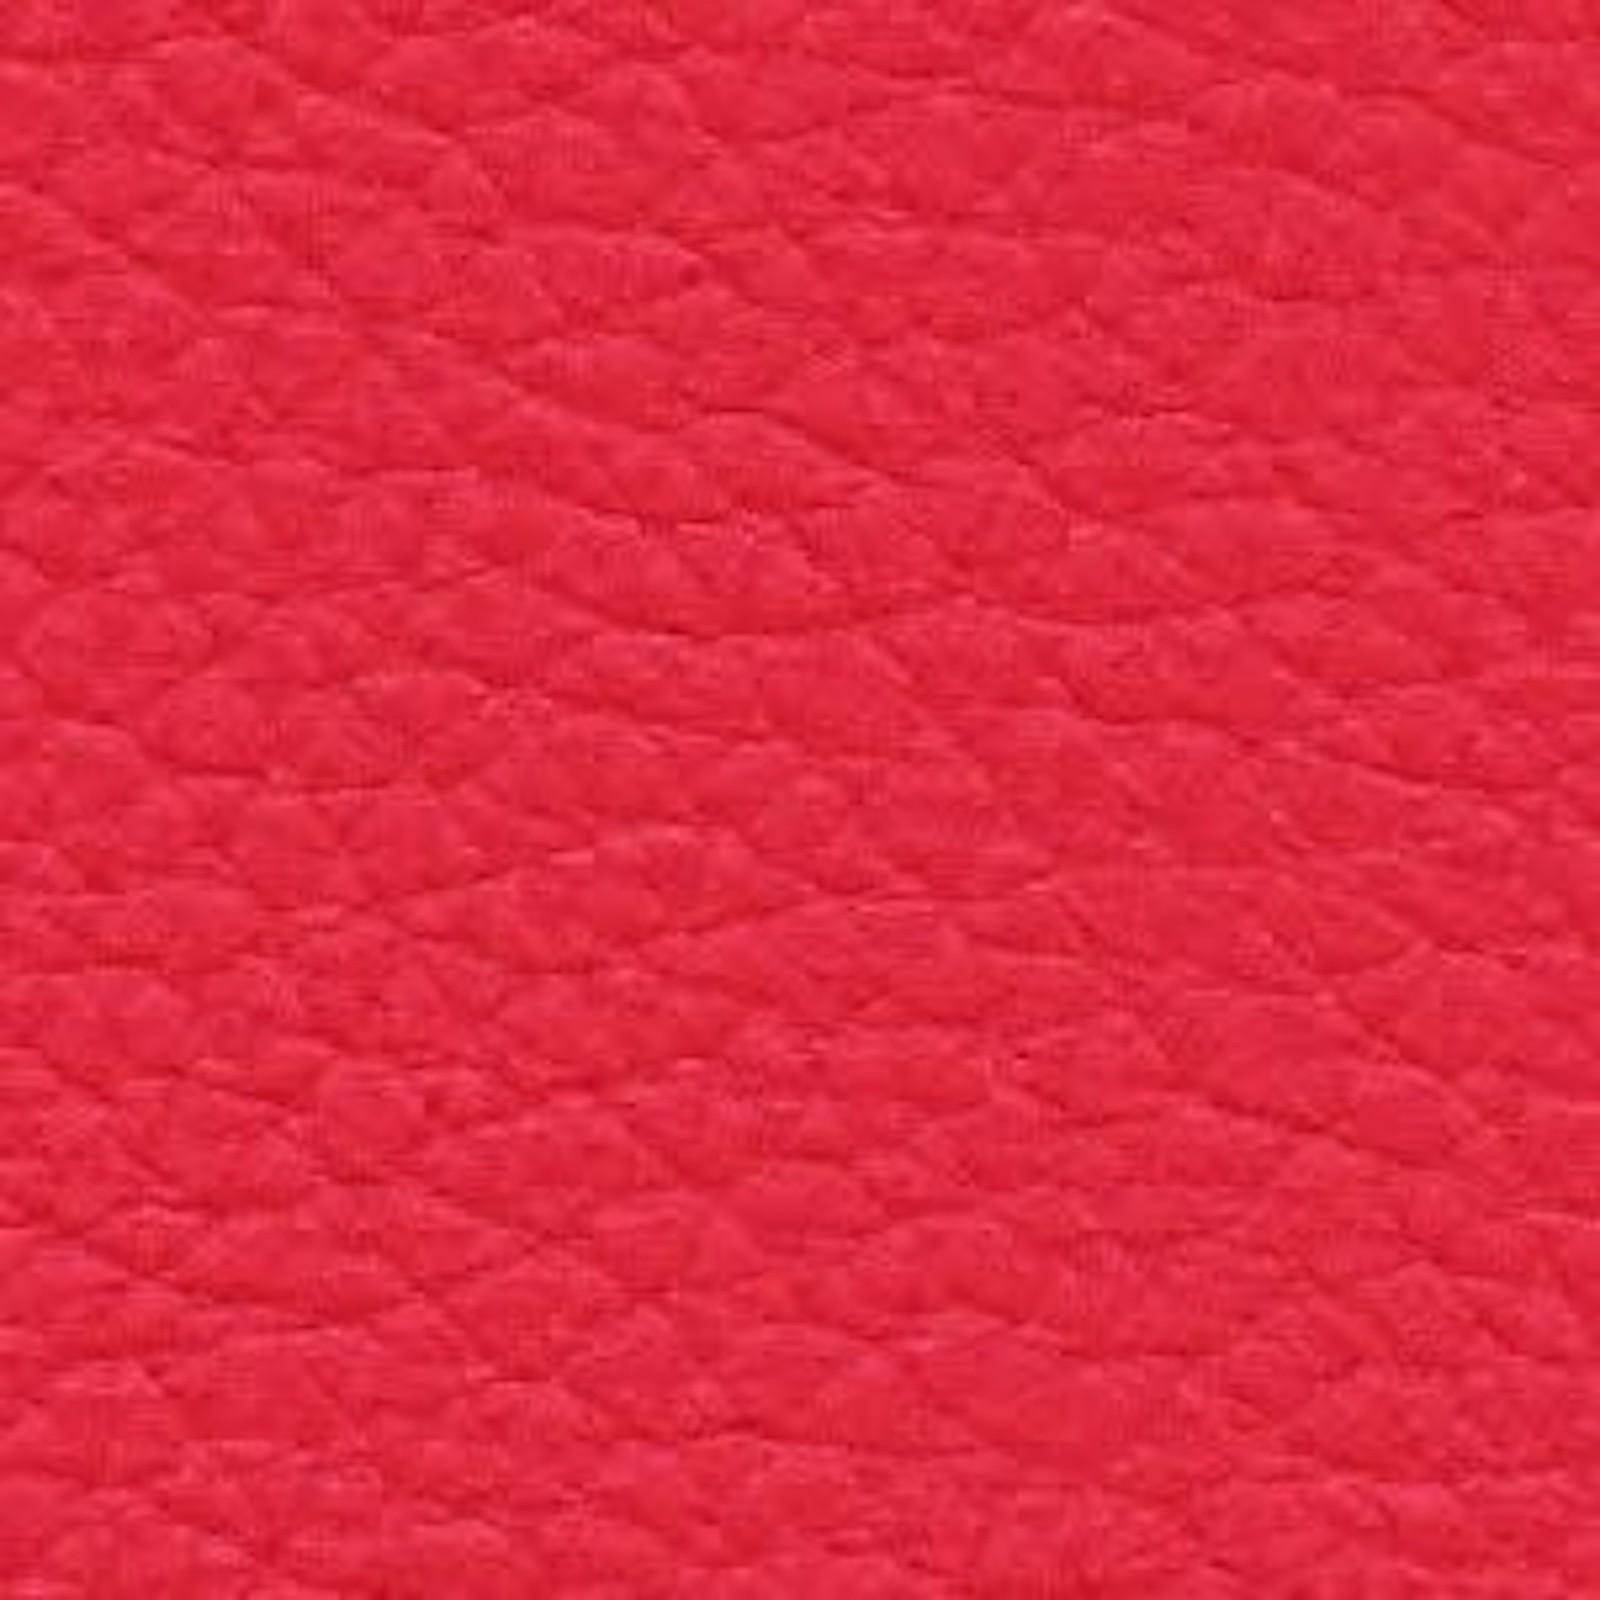 pelle - texture - download